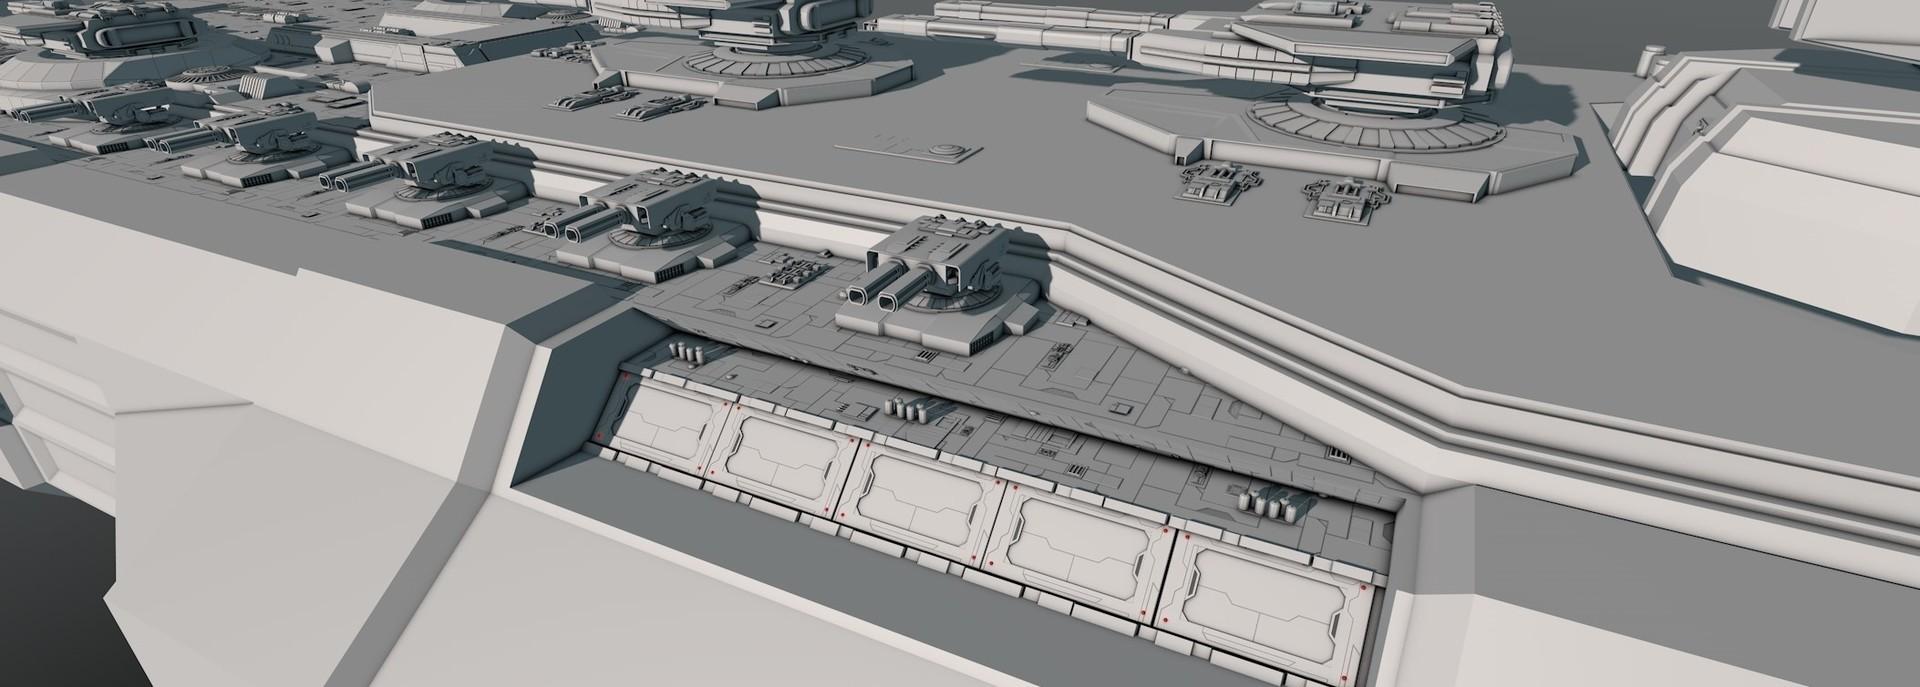 Glenn clovis concept battleship saratoga 14b